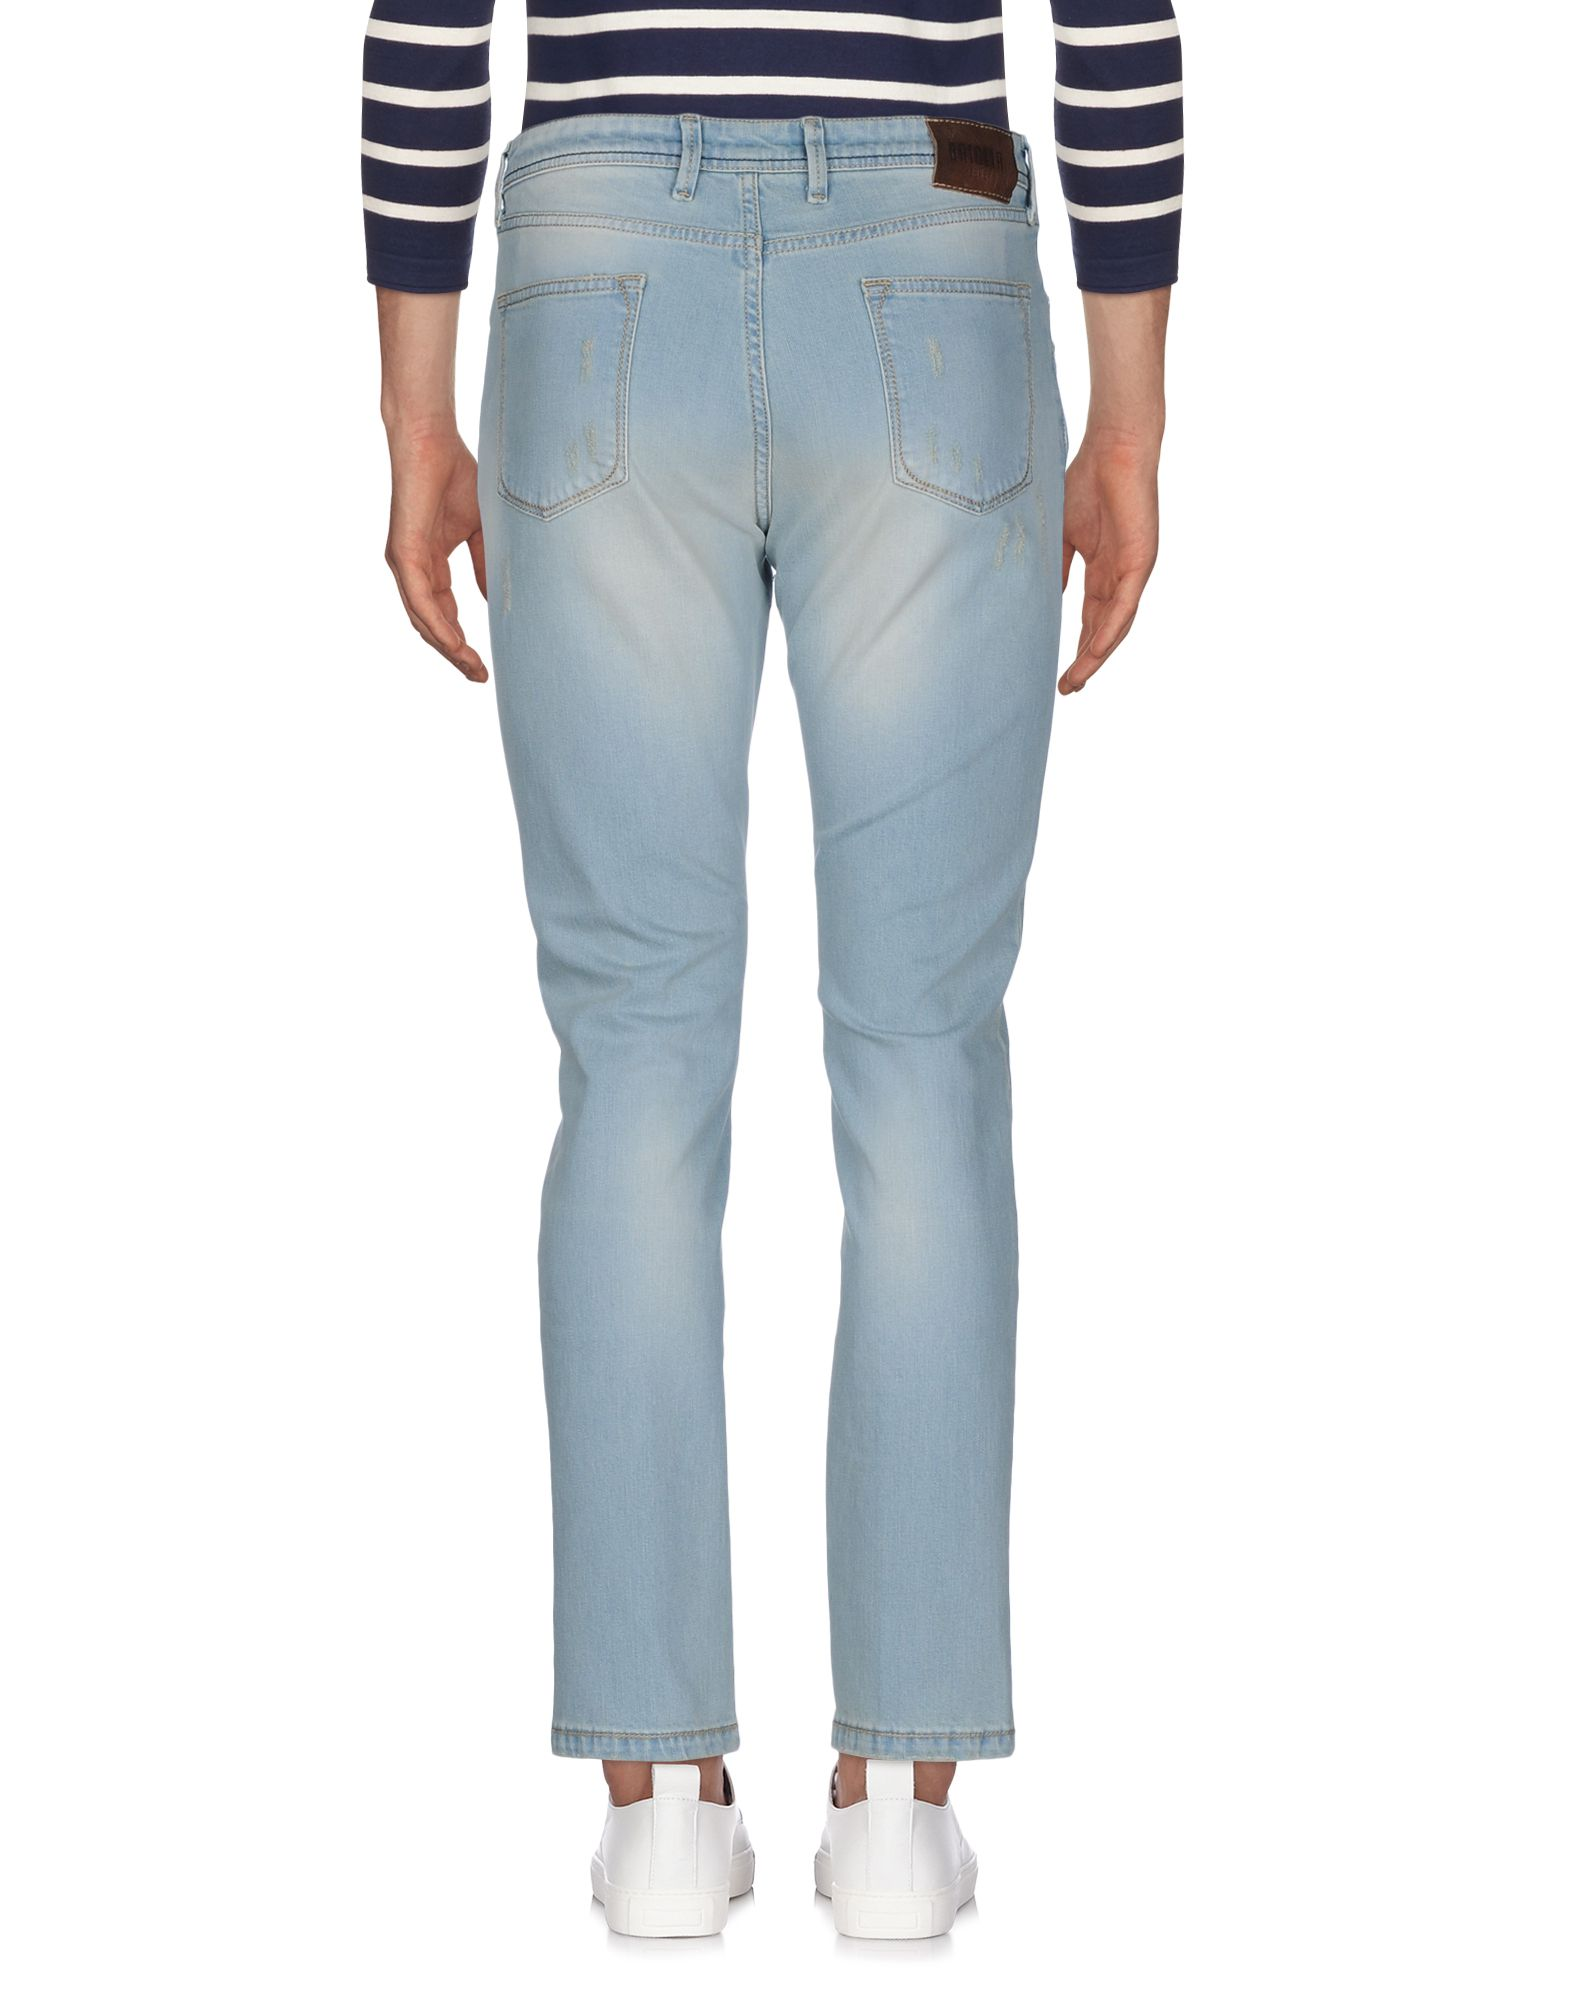 Pantaloni Jeans Briglia 1949 42636622RK Uomo - 42636622RK 1949 8c9cef